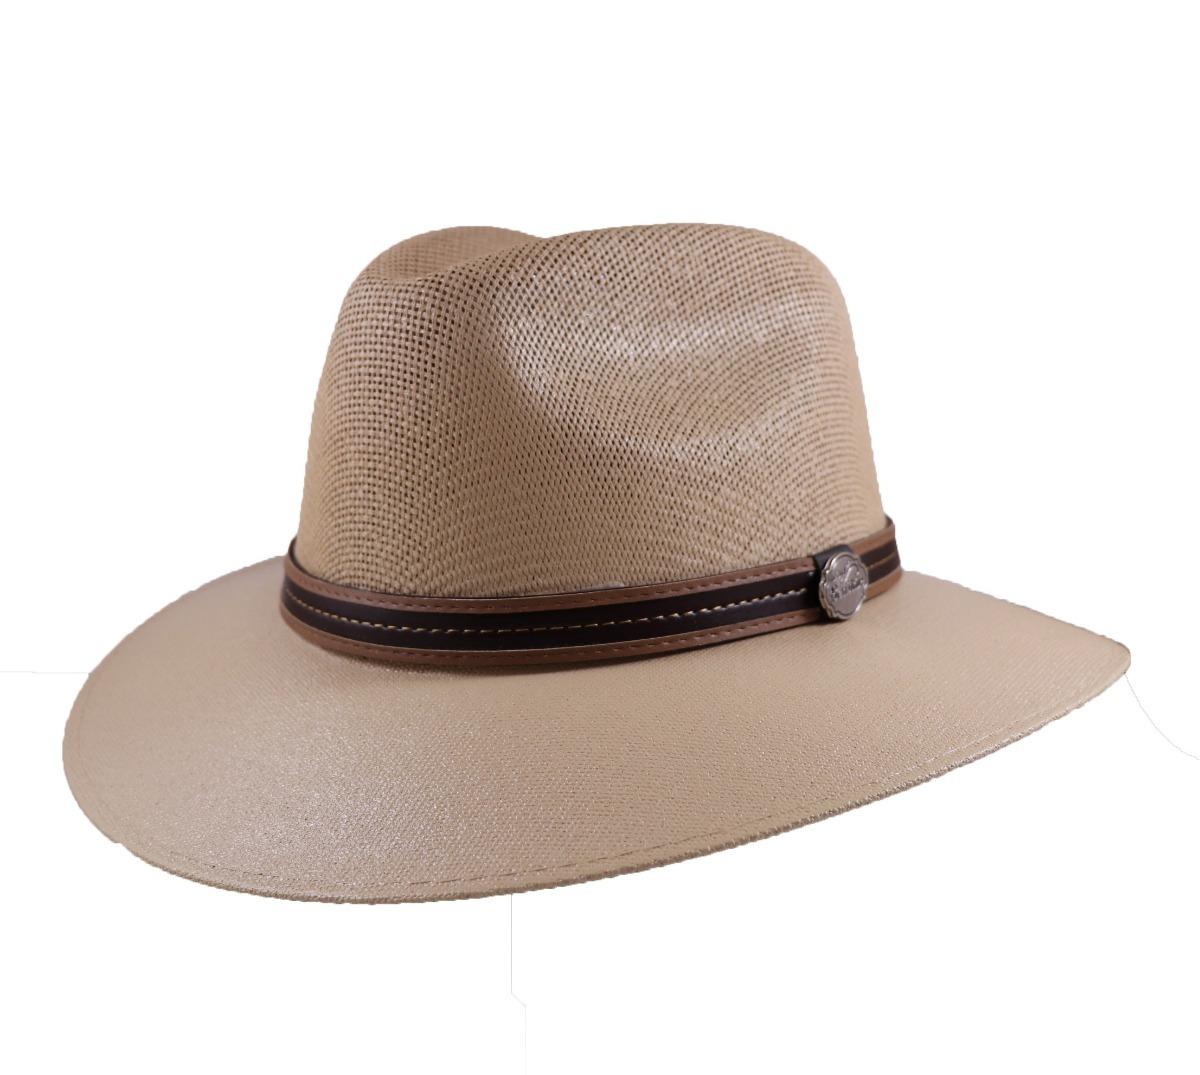 Sombrero Para La Playa Panama Unisex Indiana Jones -   195.00 en ... 9806259aa91